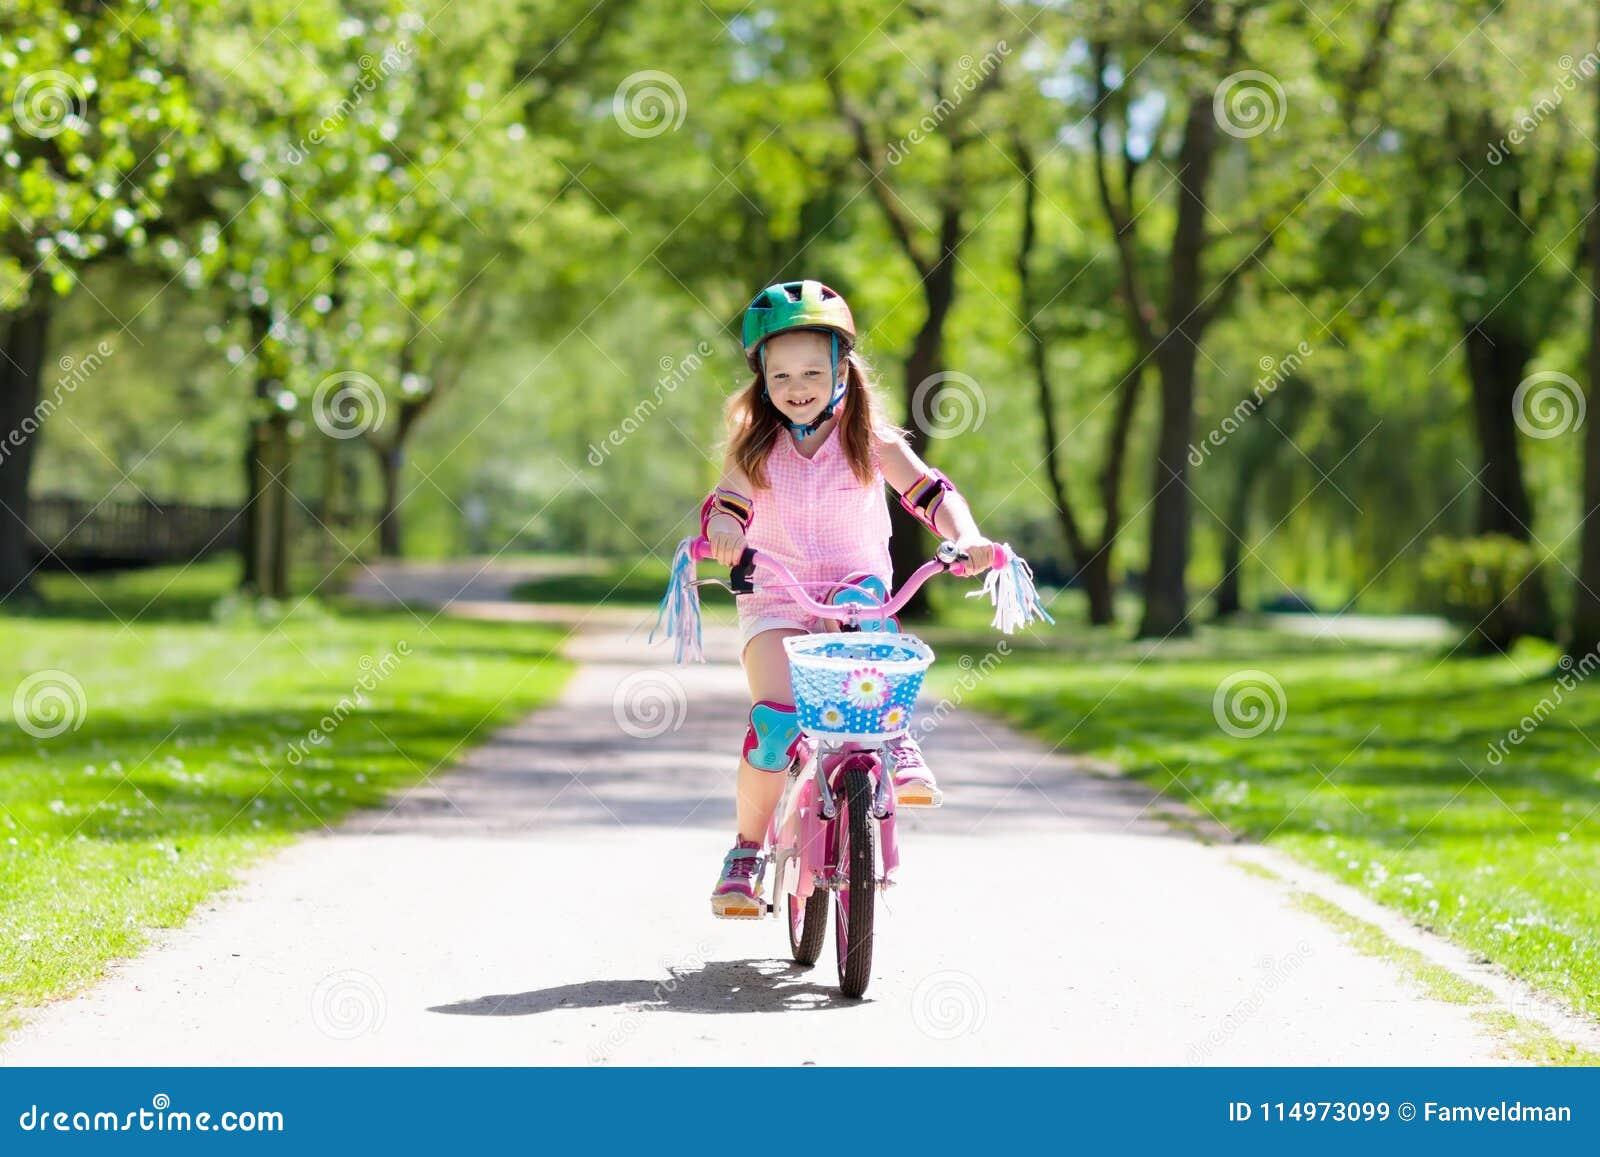 Child On Bike. Kids Ride Bicycle. Girl Cycling. Stock Image - Image of  lifestyle, helmet: 114973099